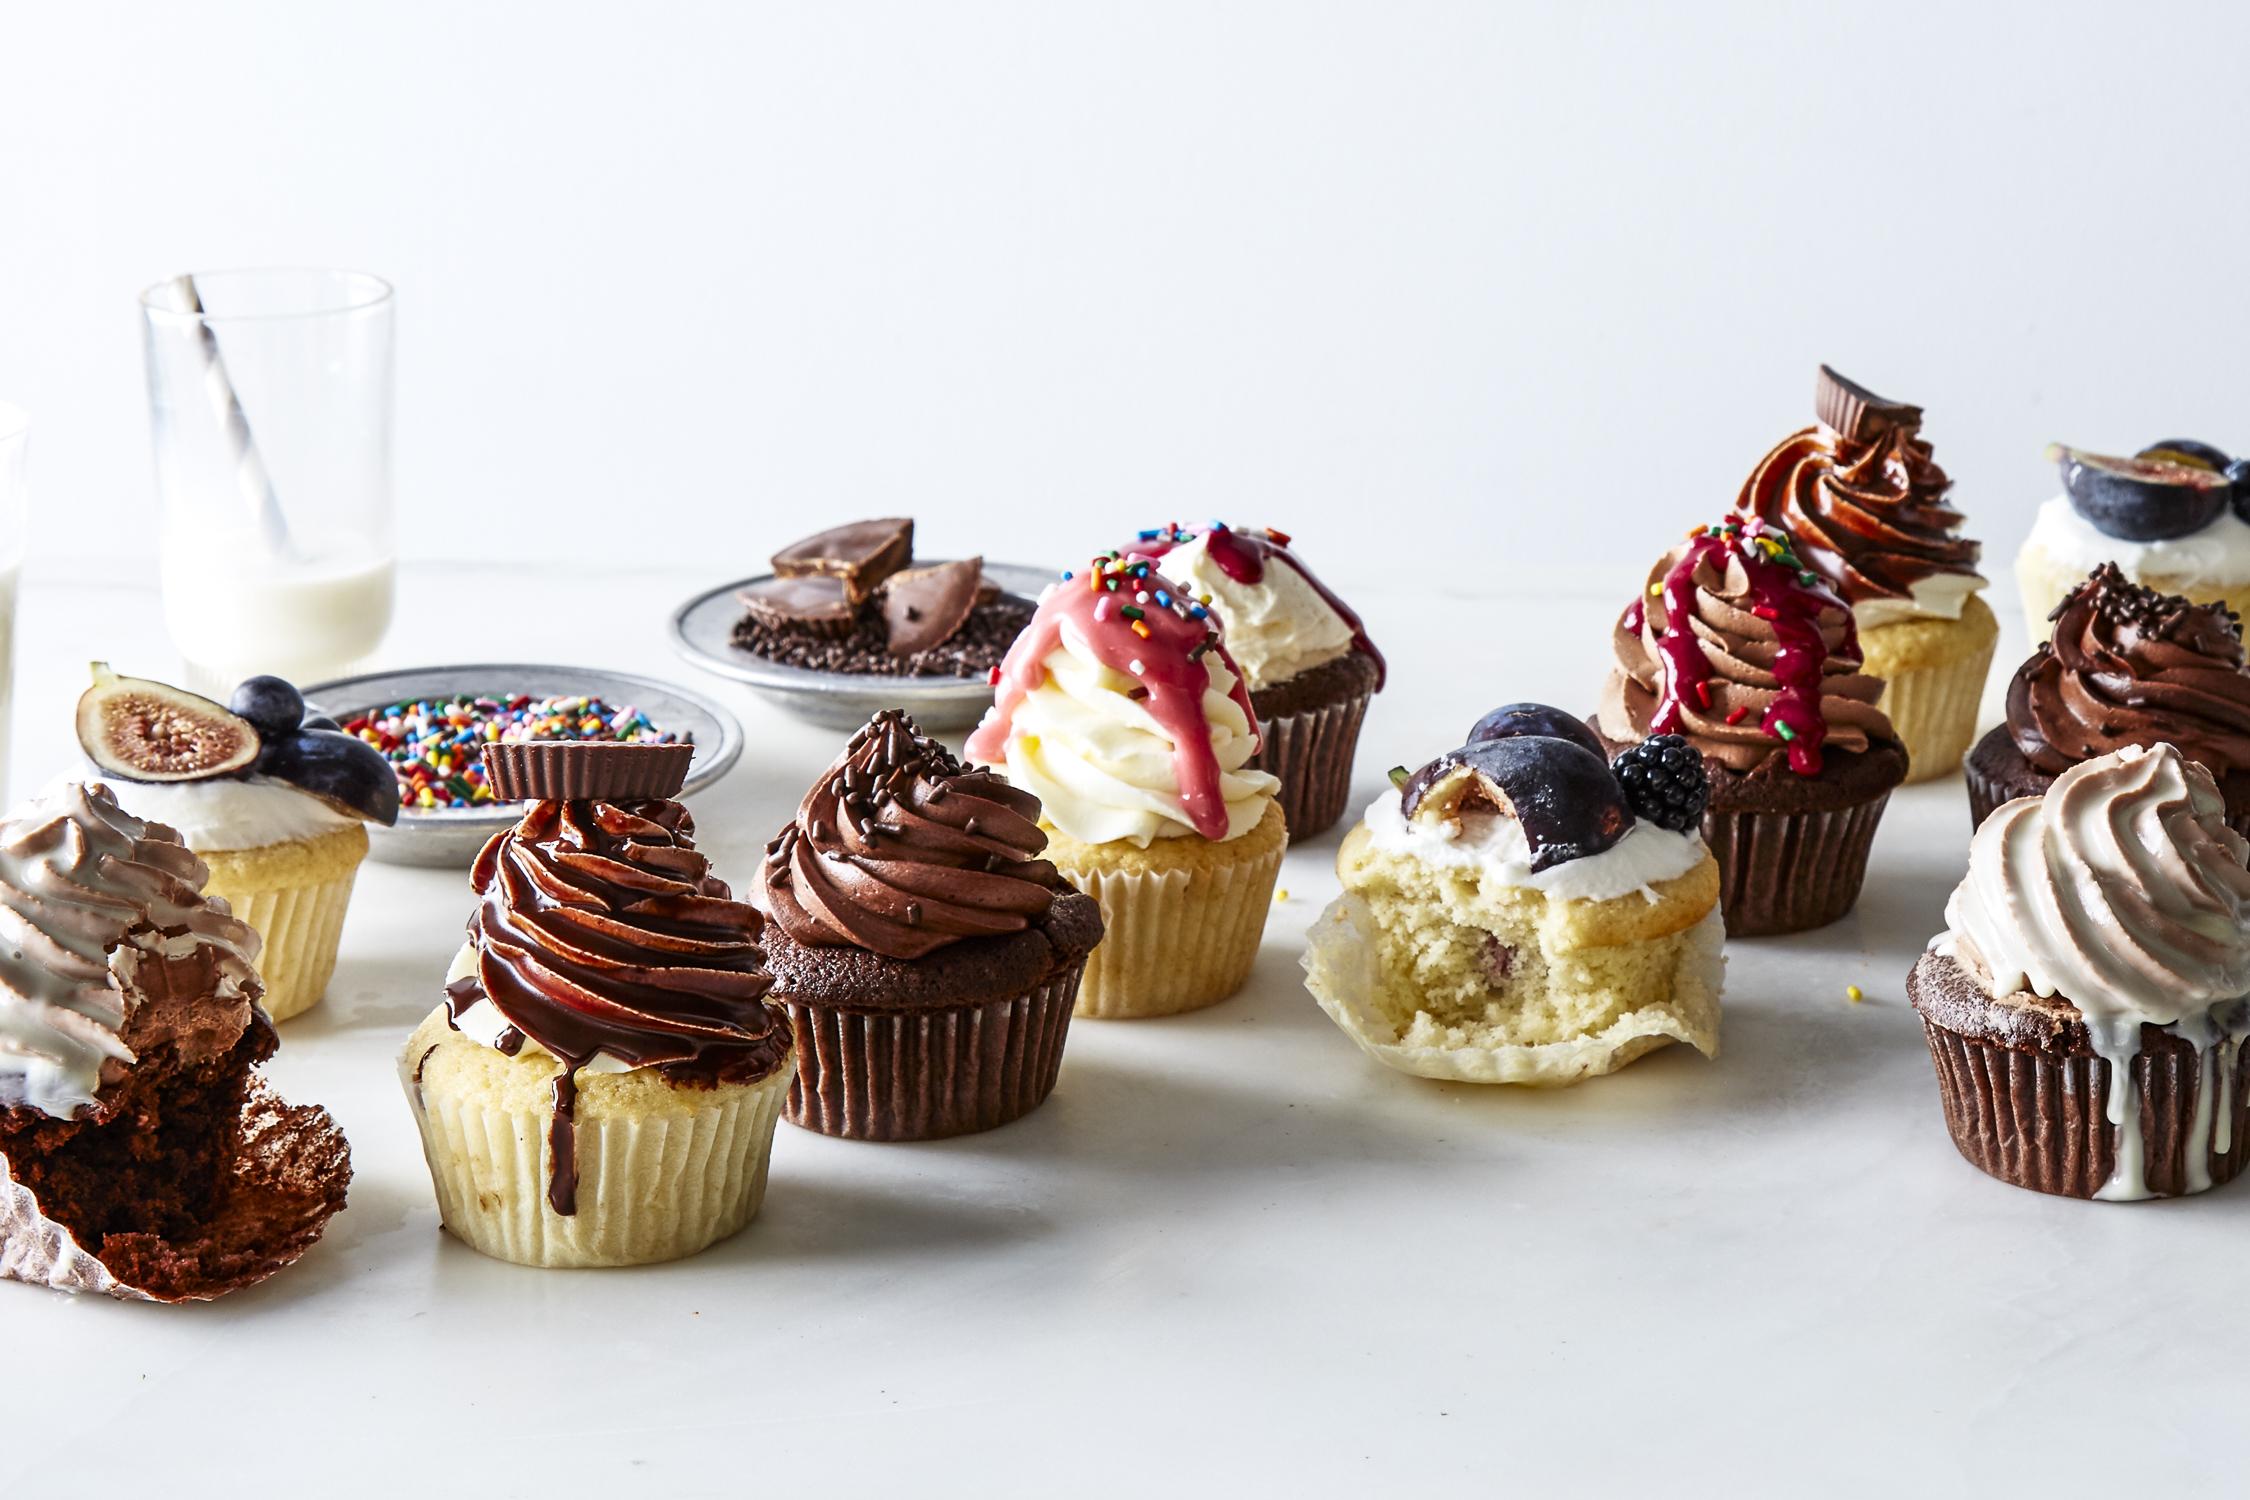 2015-0824_how-to-bake-cupcakes_bobbi-lin_8479.jpg